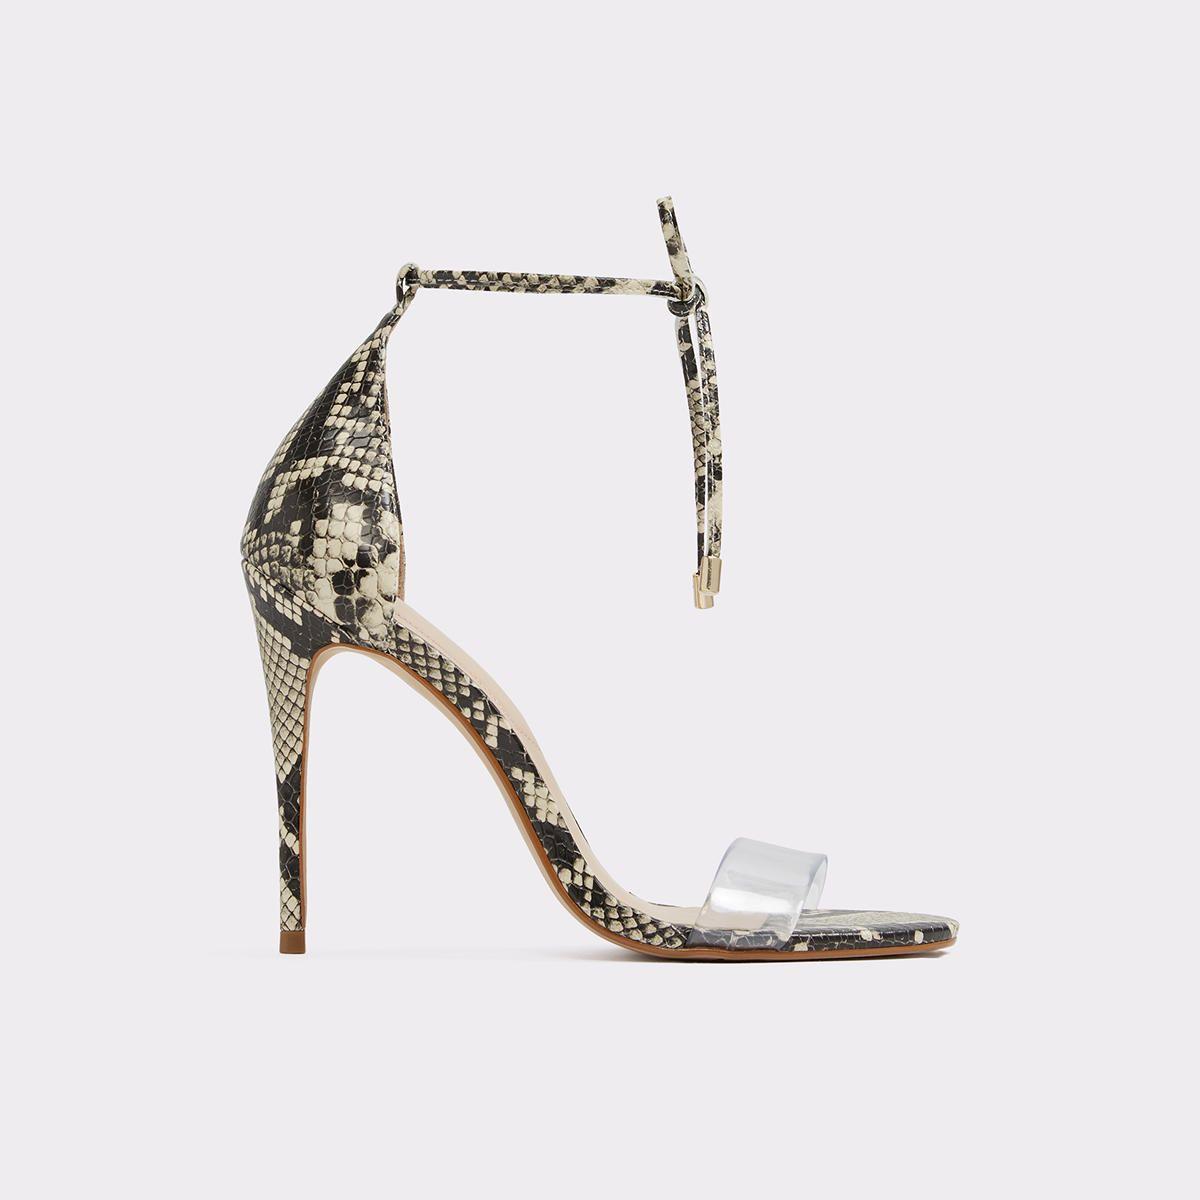 5d55b99e7f84d Vaycia Natural Multi Women's Heeled sandals | Aldoshoes.com US in ...